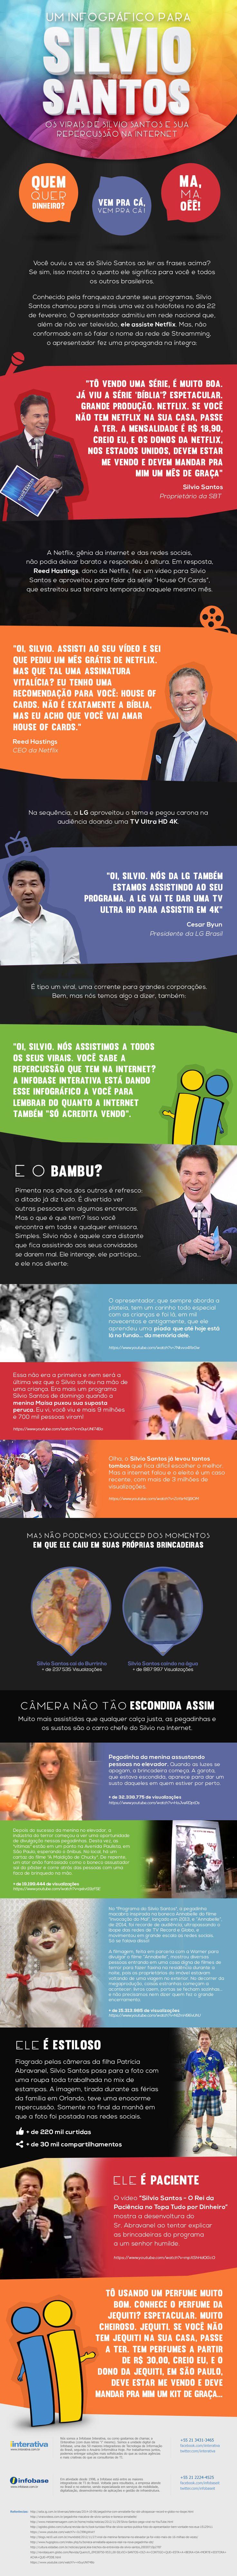 Silvio Santos vira viral - infográfico - Assuntos Criativos